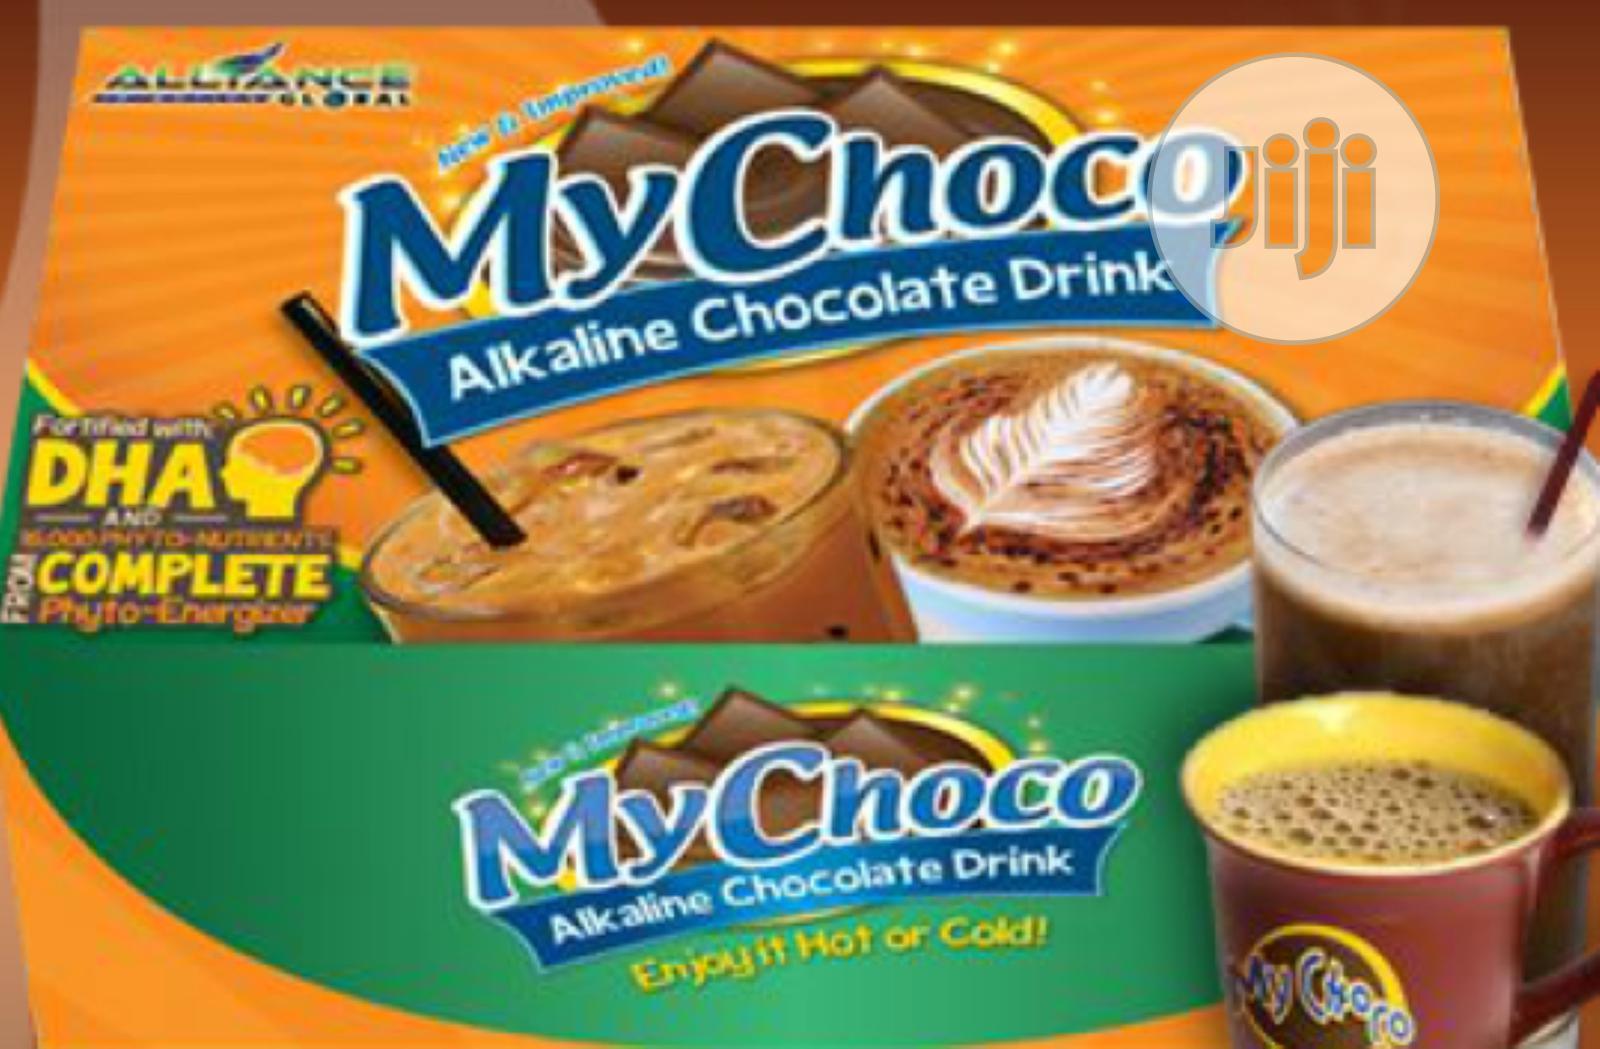 Mychoco Alkaline Tea/Chocolate Beverage.My Choco